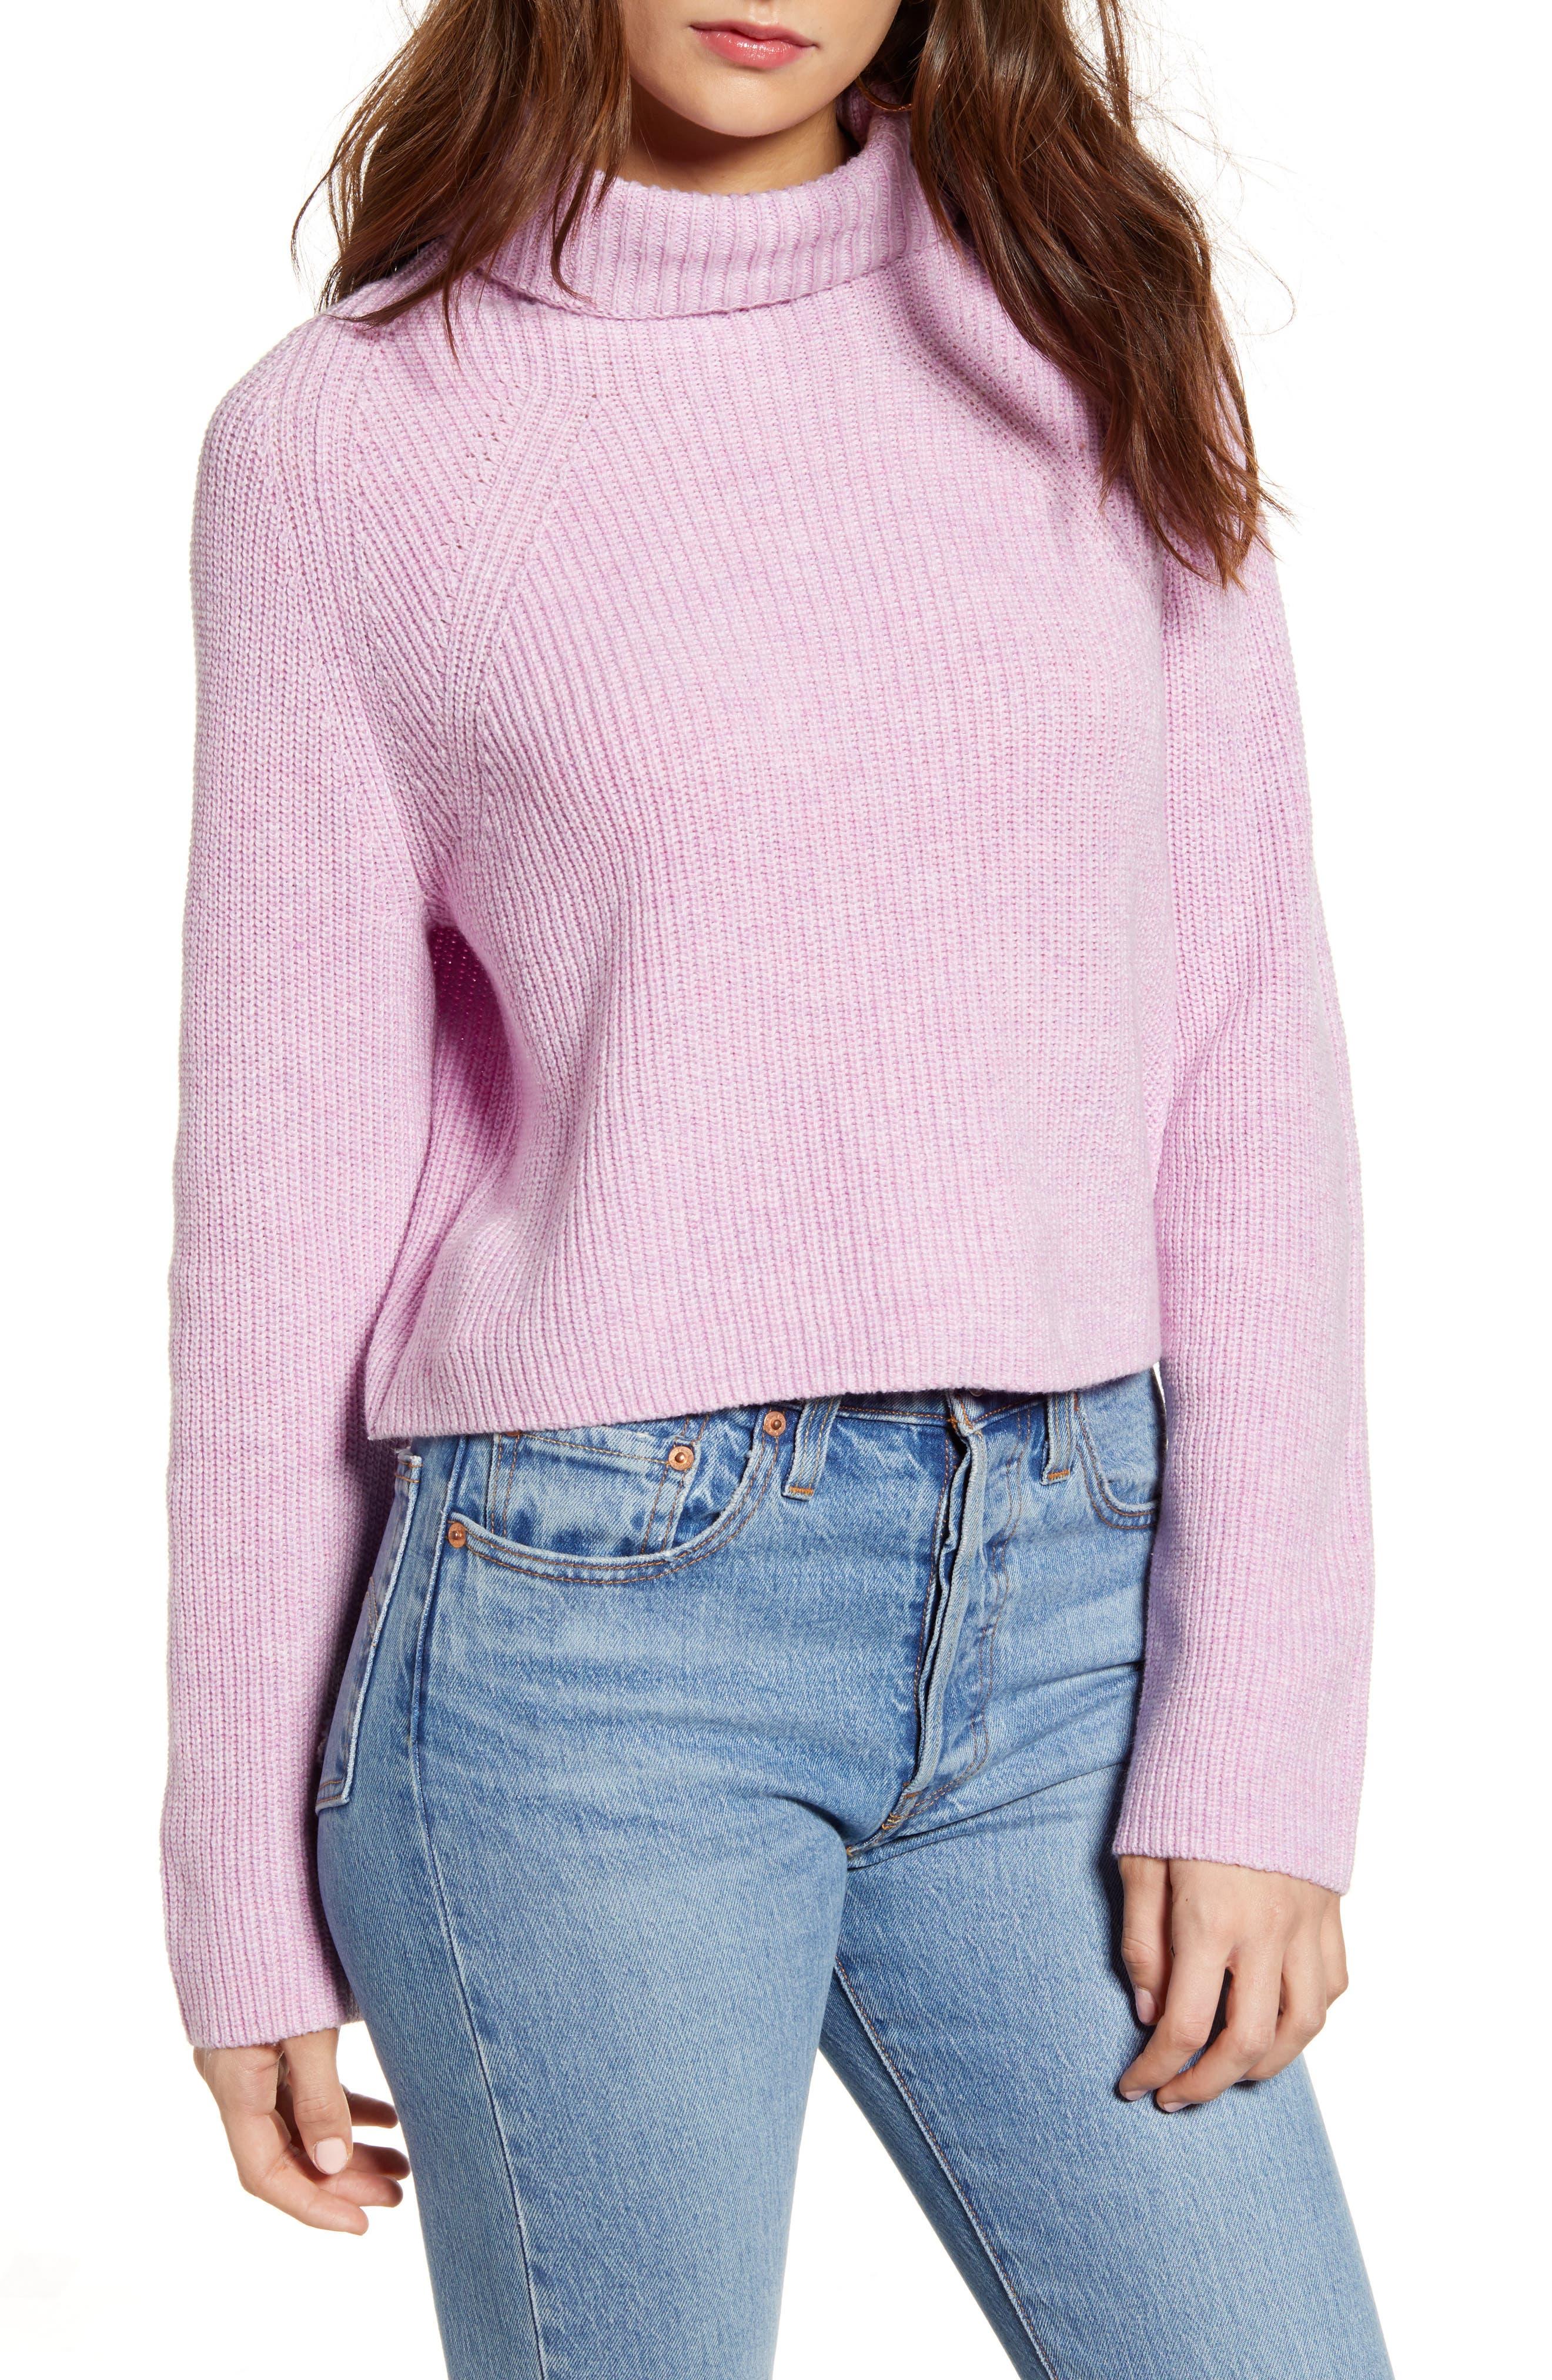 Leith Transfer Stitch Turtleneck Sweater (Regular & Plus Size)